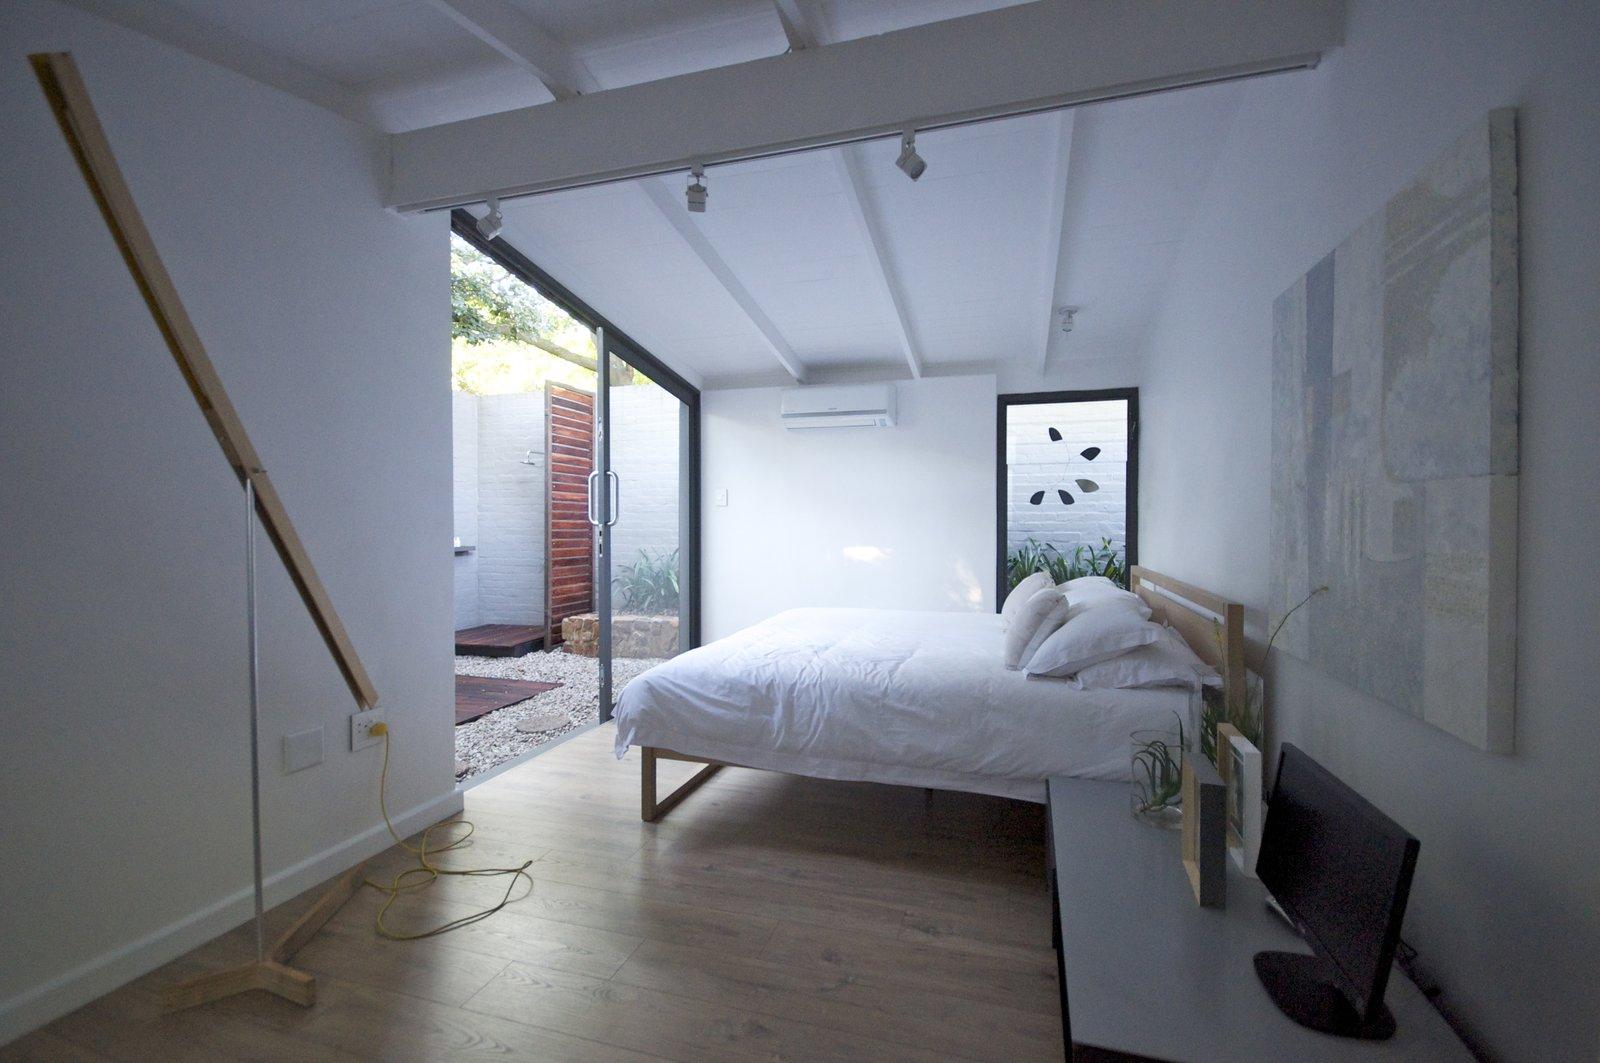 Bedroom, Bed, Ceiling Lighting, Light Hardwood Floor, and Track Lighting main bedroom  Grey House